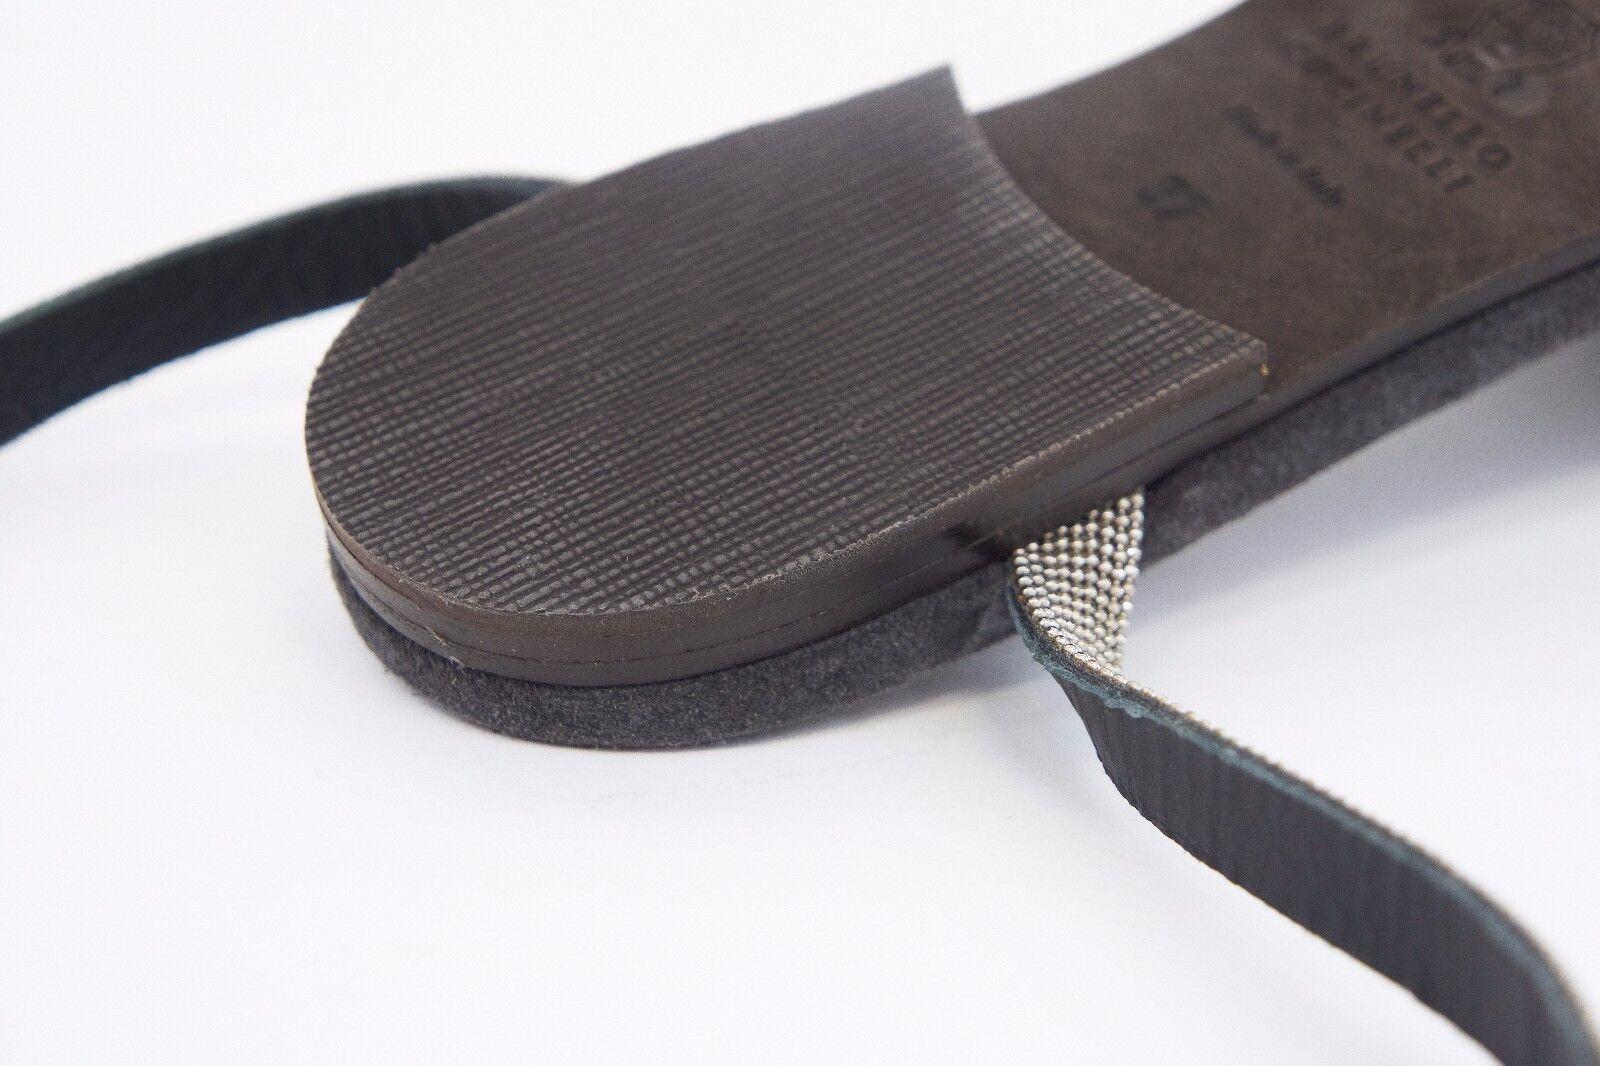 1195 Brunello Cucinelli Chrome Chrome Chrome Leather Monili Beaded Ankle Strap Flats A176 786192